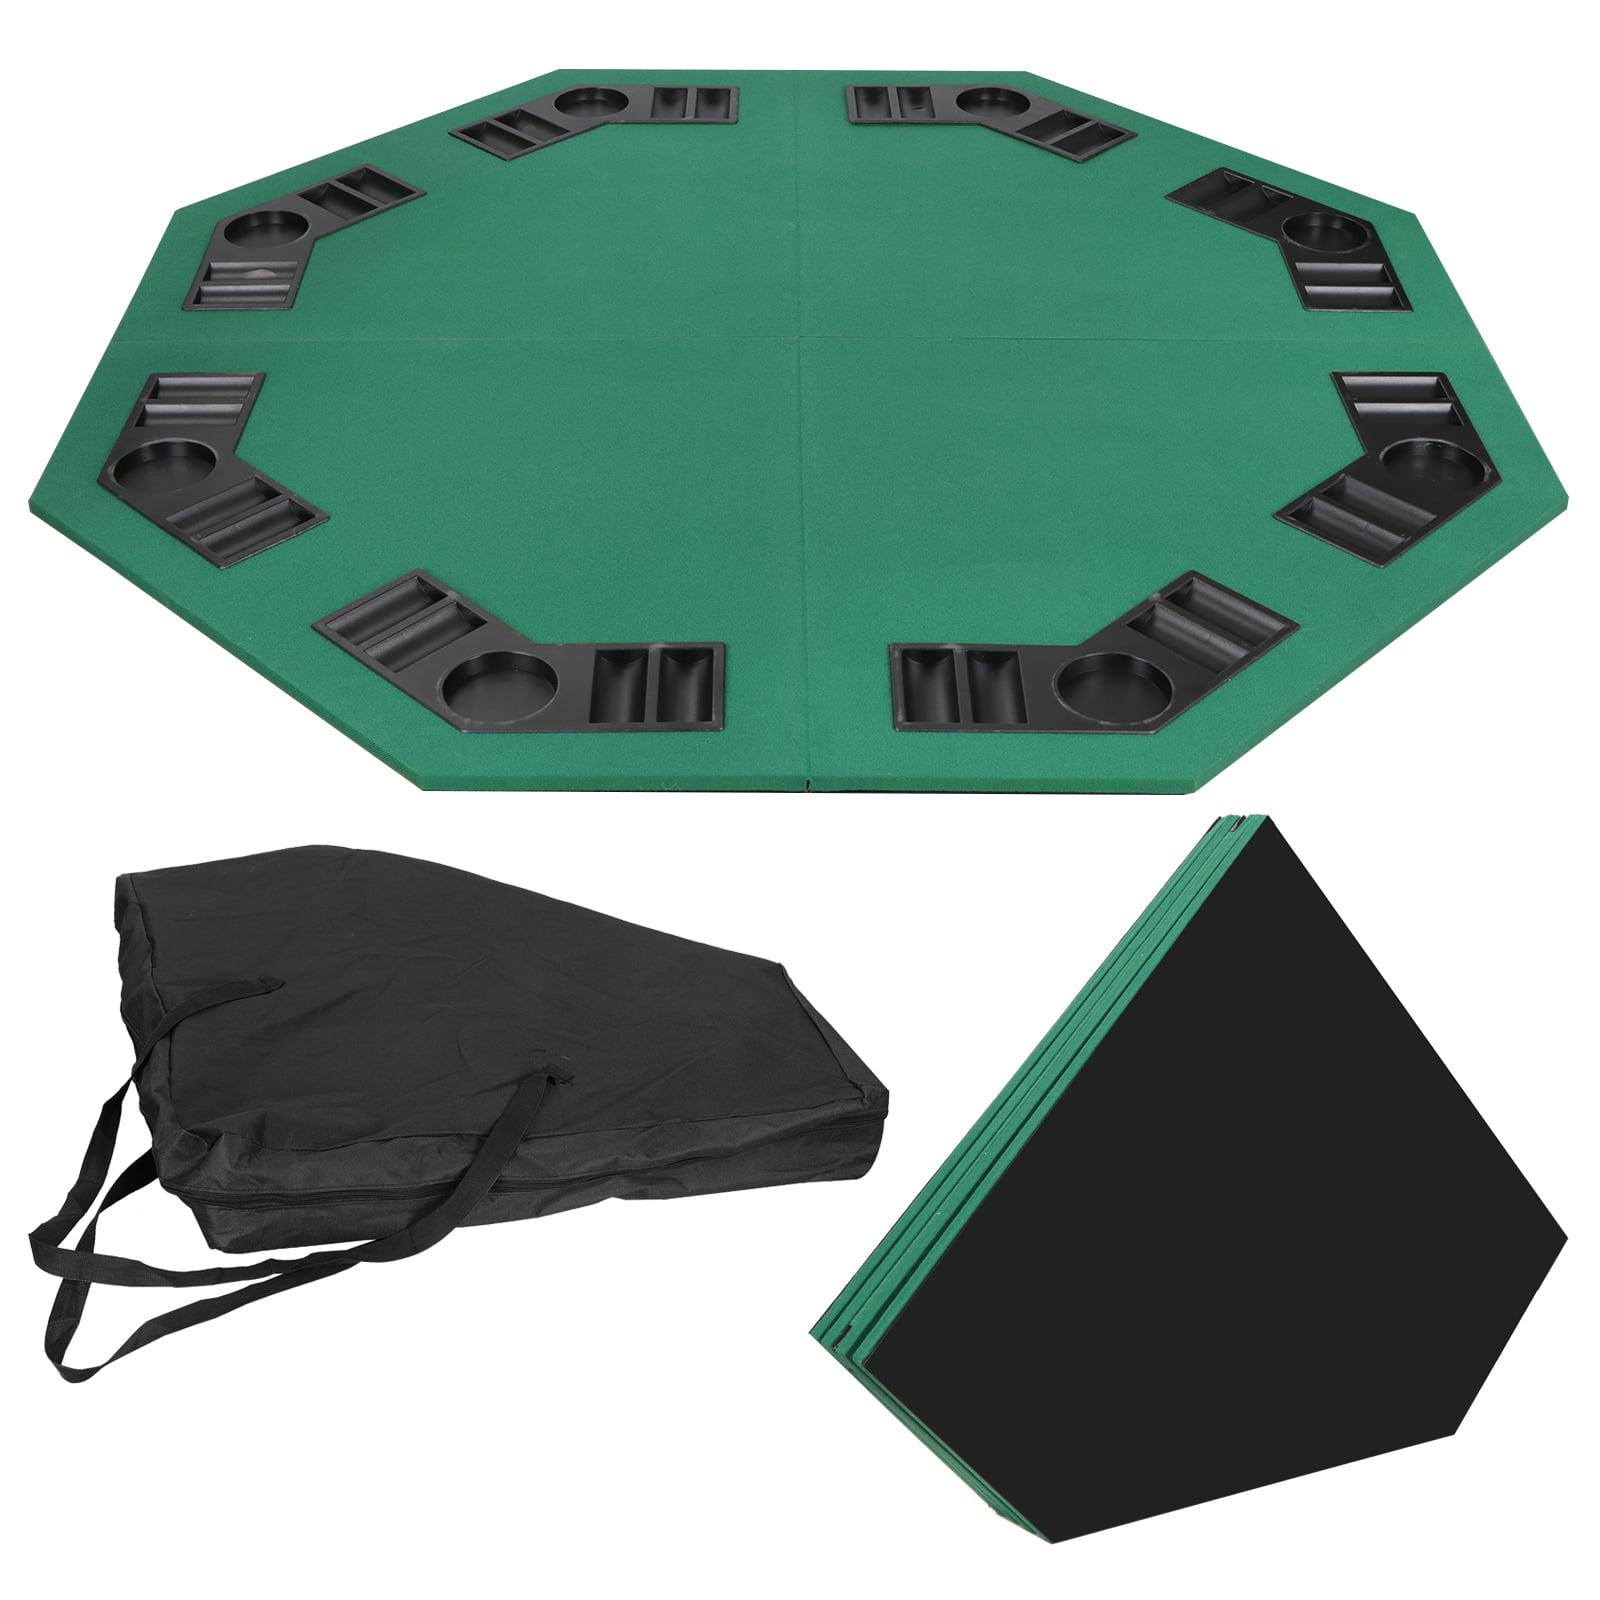 Zeny 48 Green Octagon 8 Player Four Fold Folding Poker Table Top Carrying Case Walmart Com Walmart Com